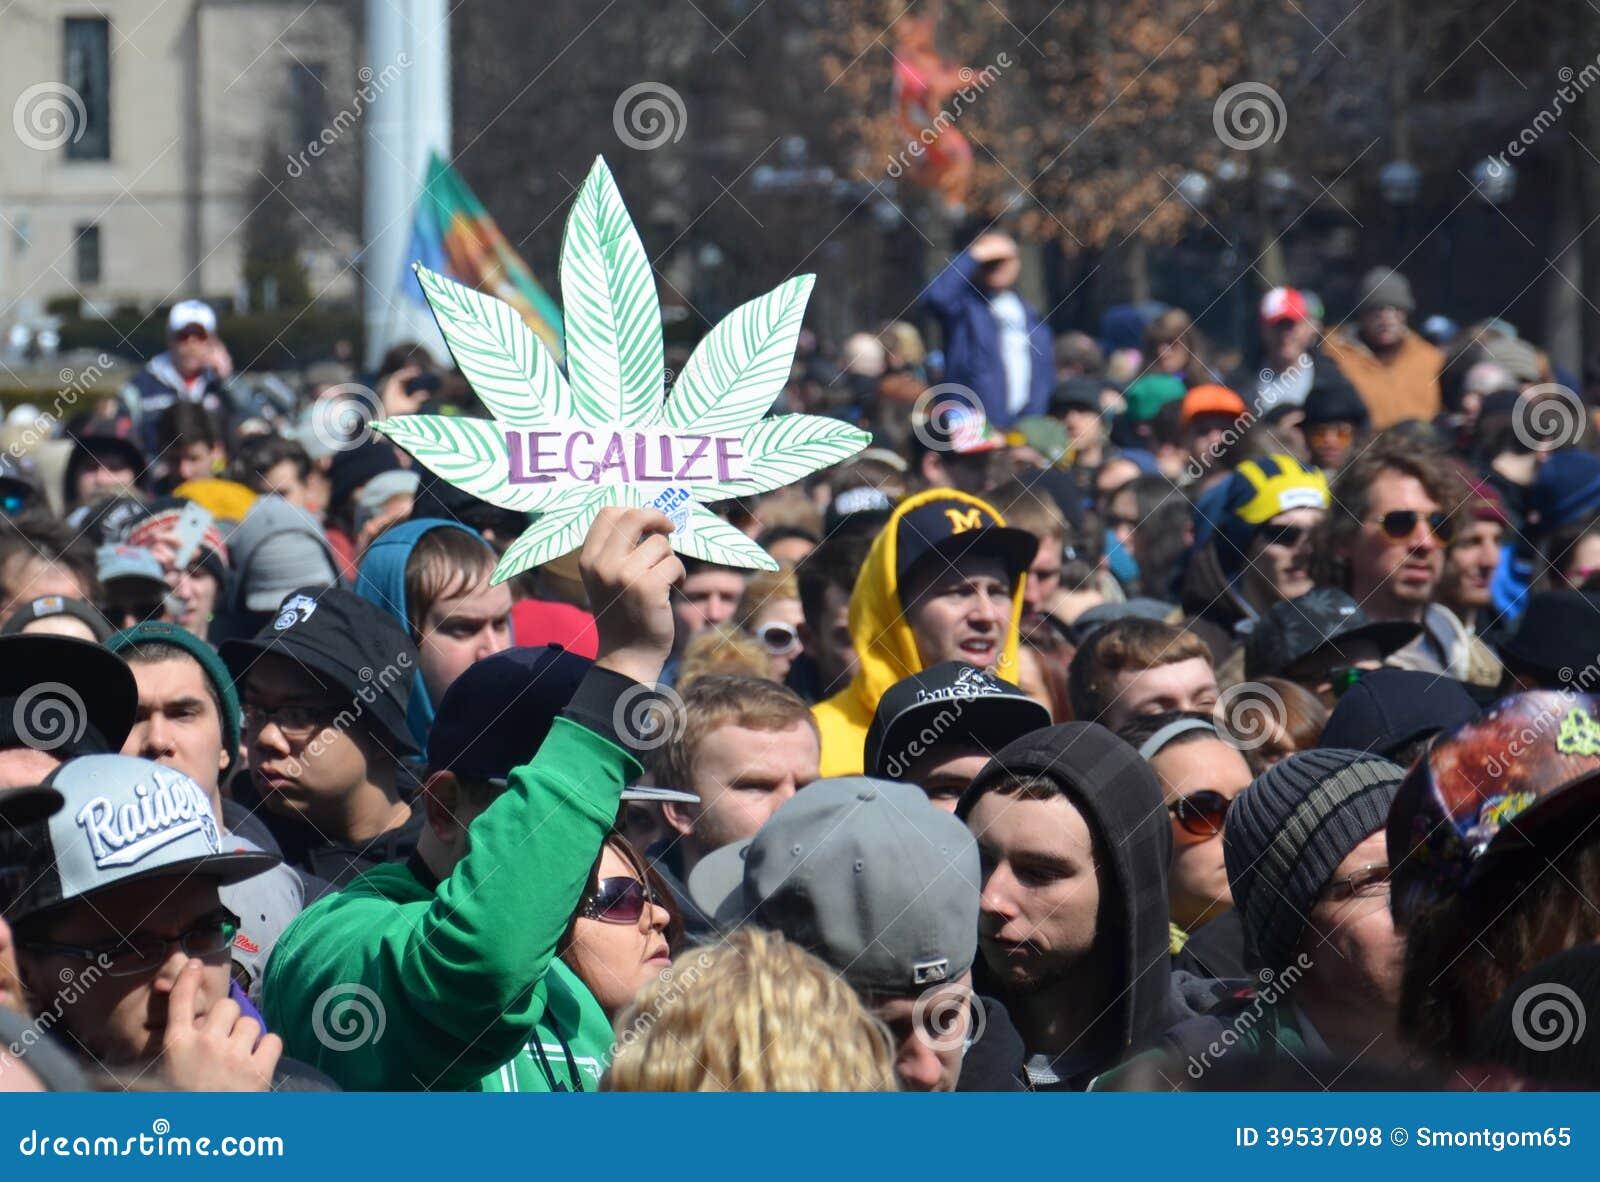 Legalize sign at Ann Arbor Hash Bash 2014